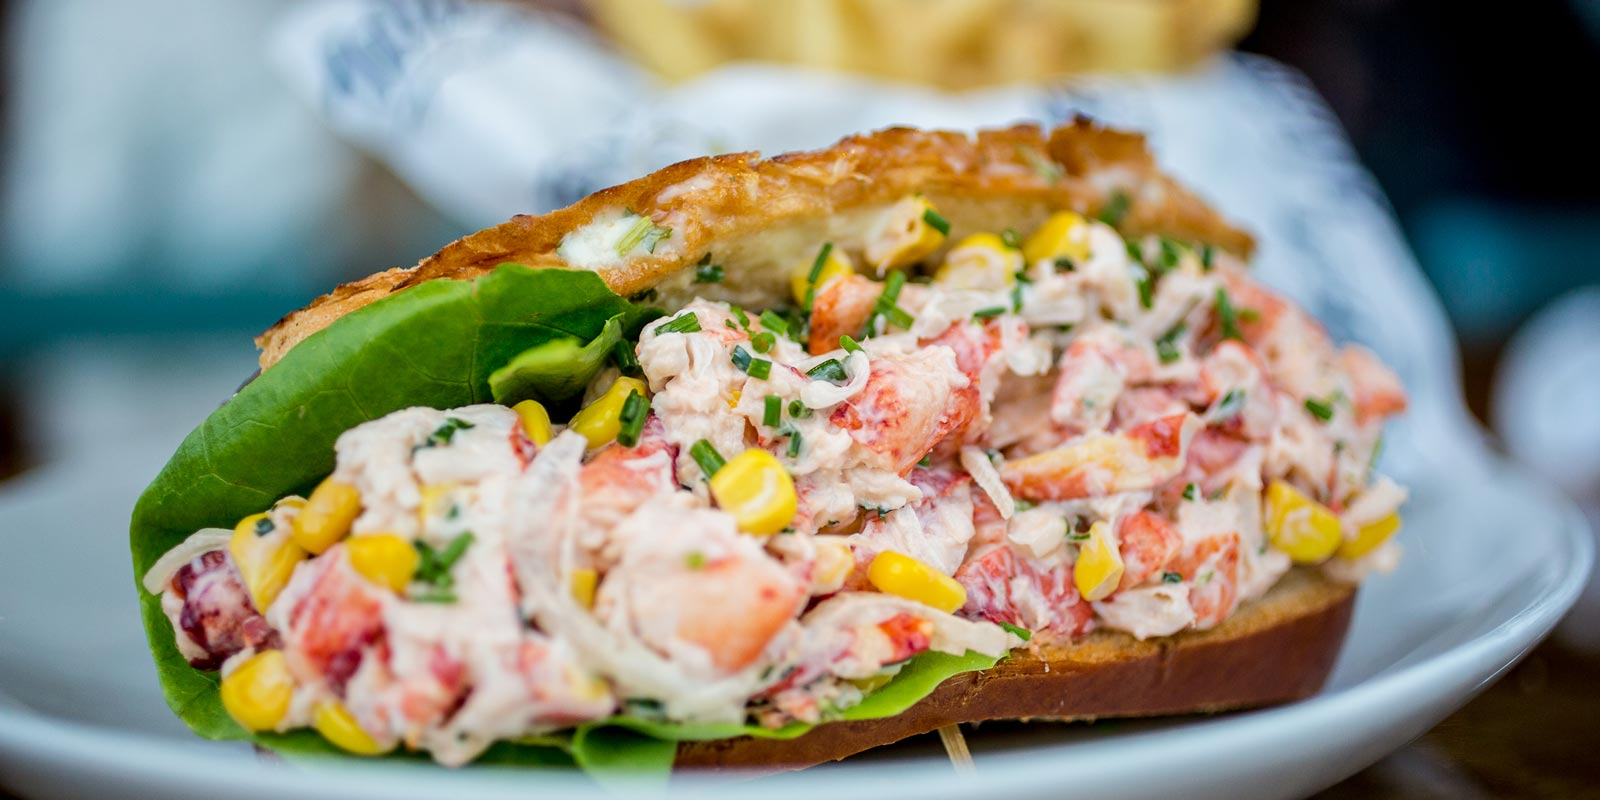 Lobster Roll in San Diego